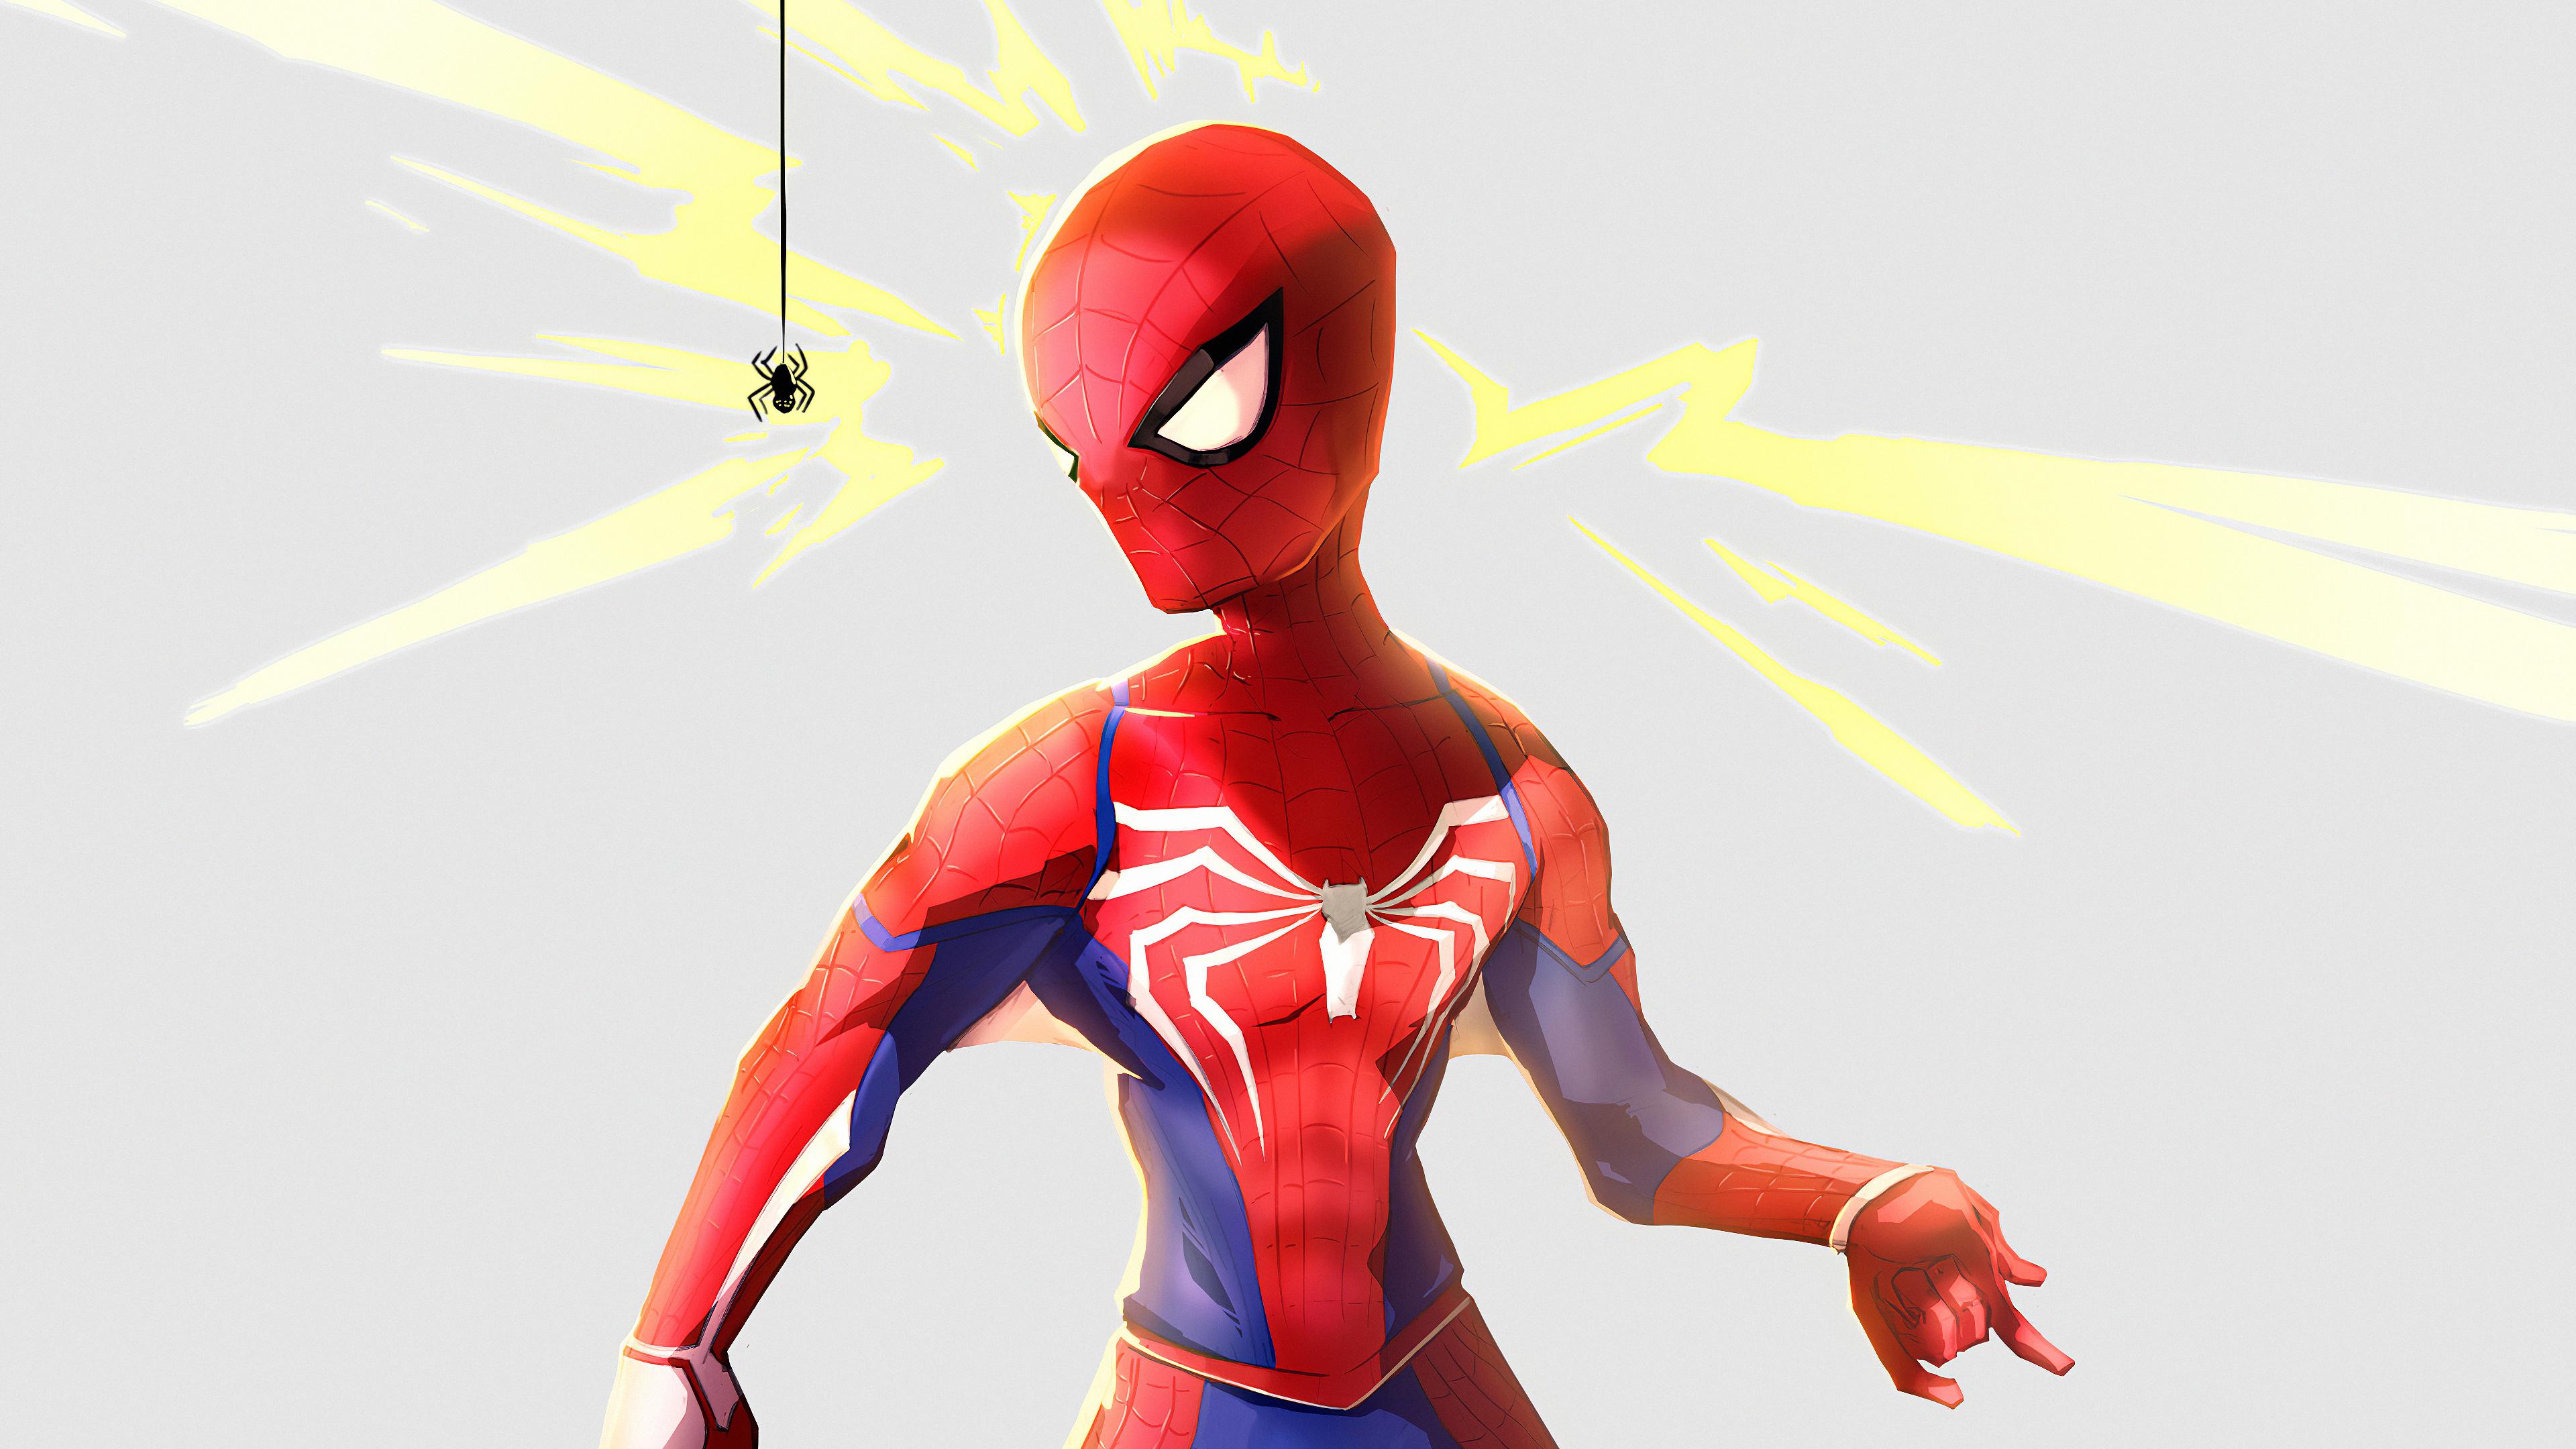 spiderman spider sense 1576090705 - Spiderman Spider Sense - Spiderman Spider Sense 4k wallpaper